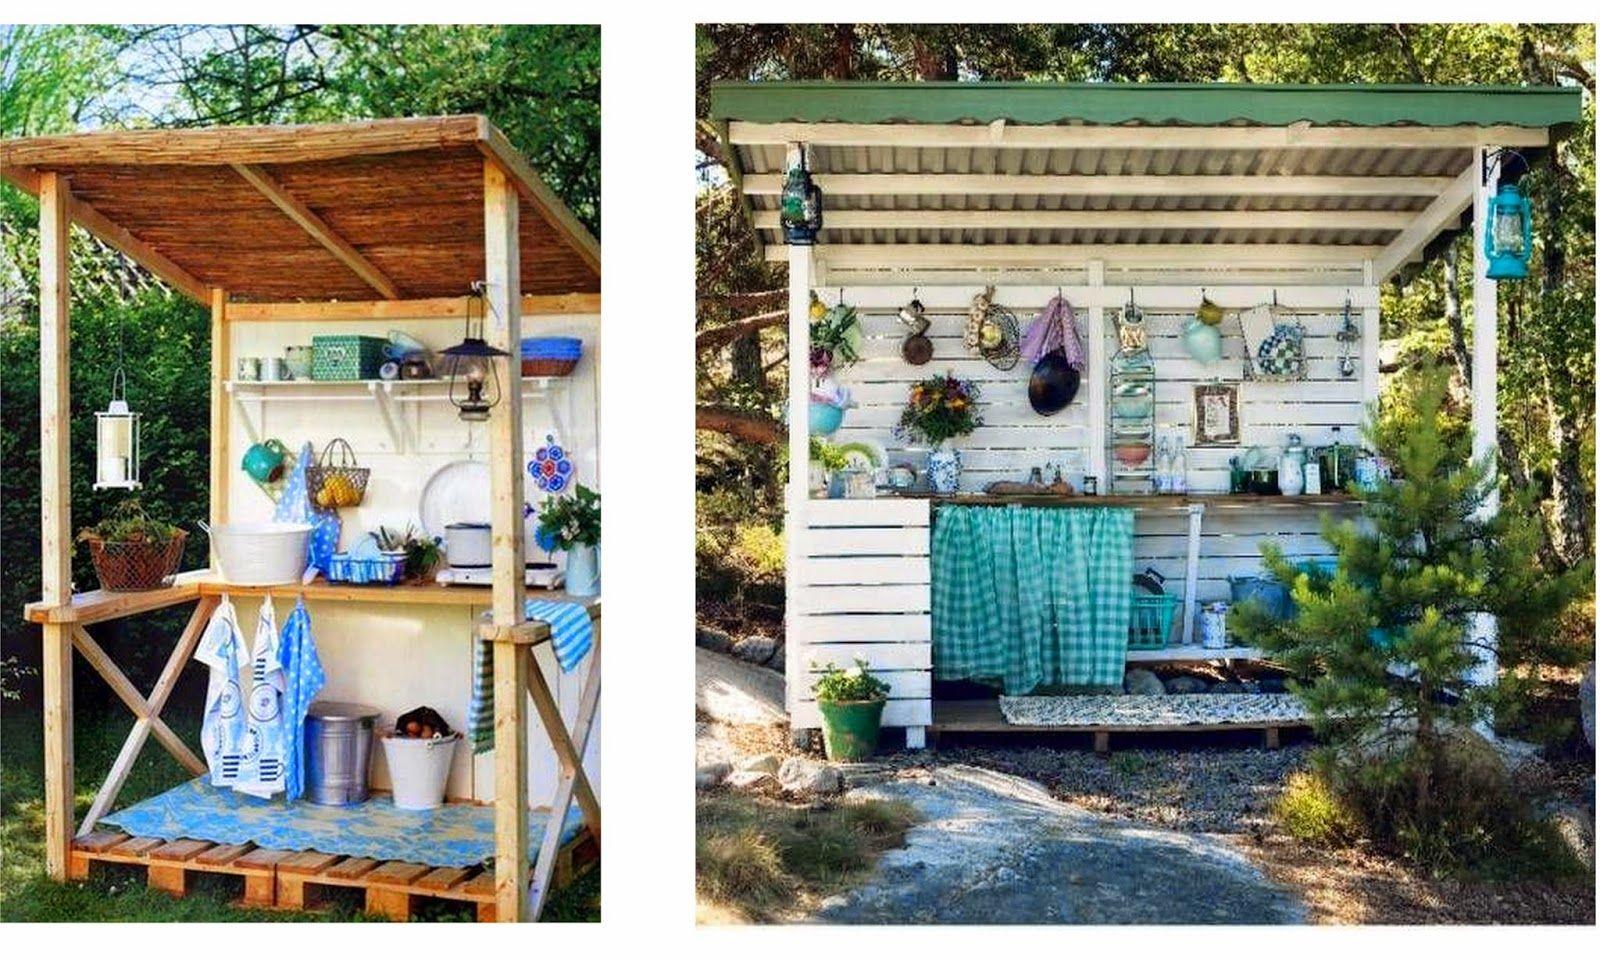 USE GARAGE DOOR FOR ROOF Dwellings Pinterest Hippie kitchen